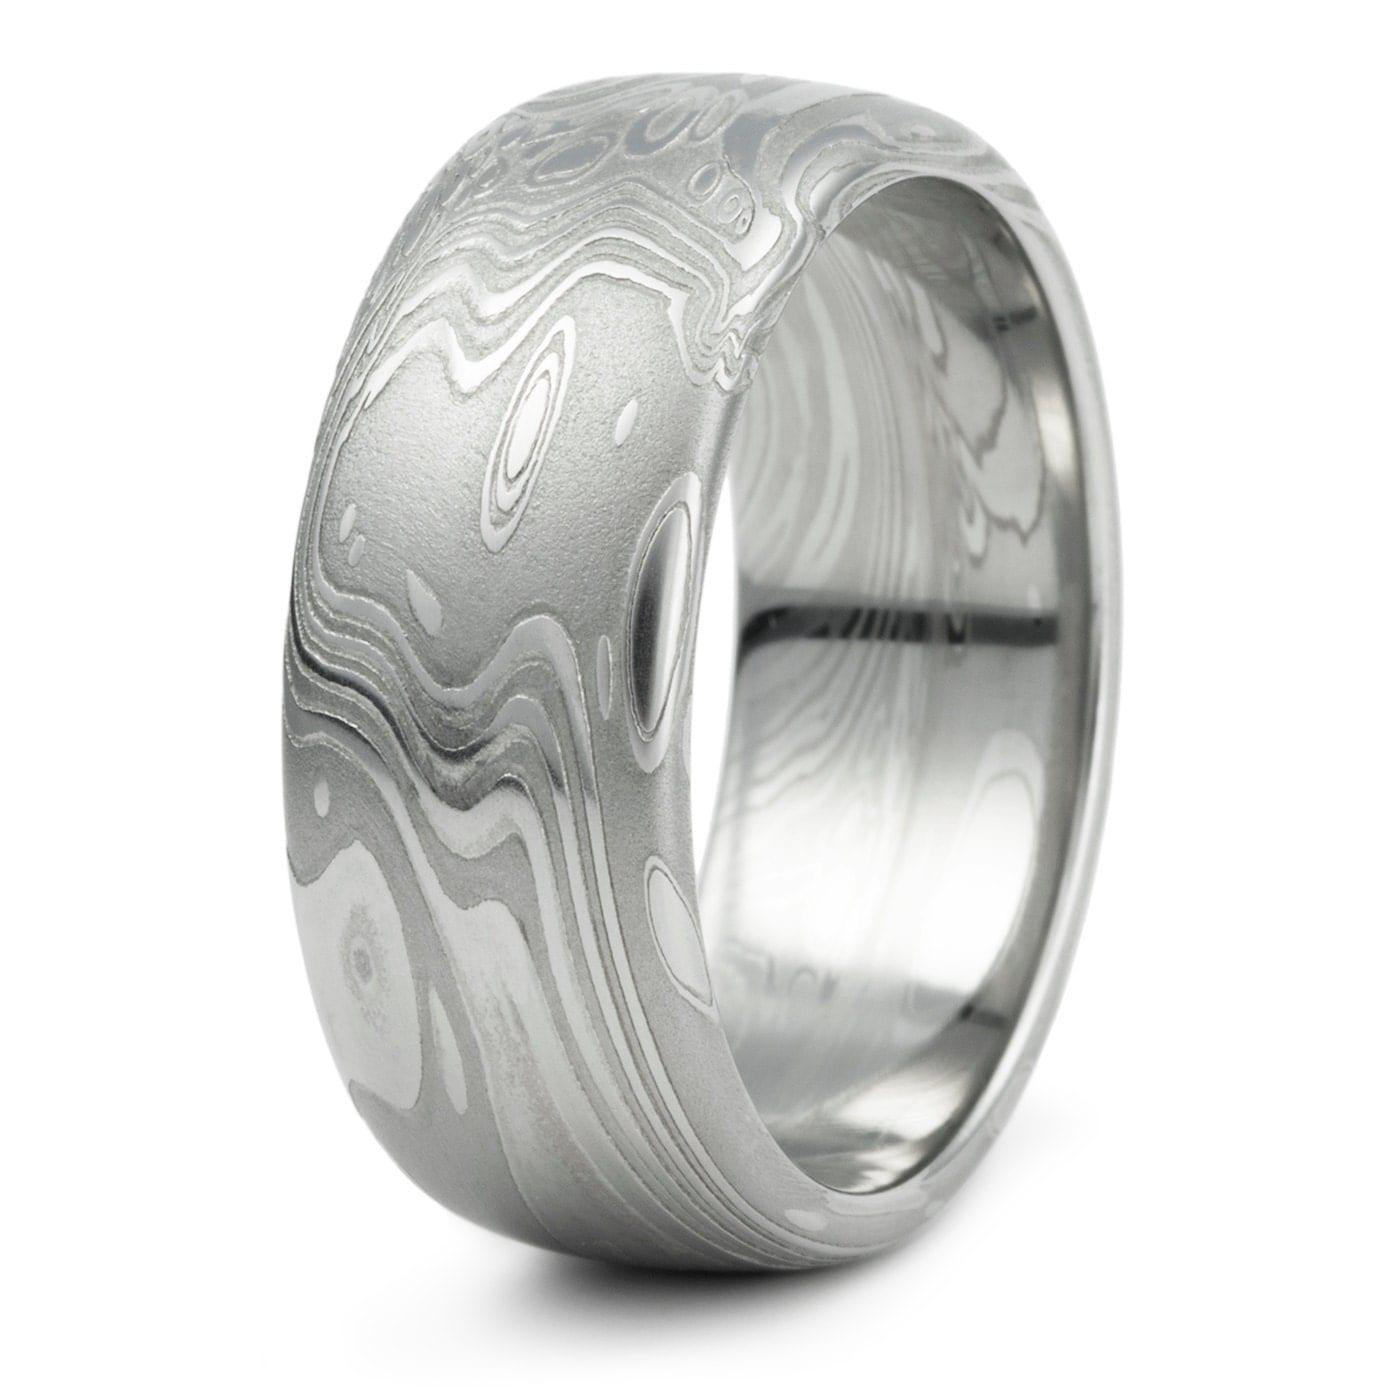 Damascus Steel Domed Wedding Ring Men s Unique Organic